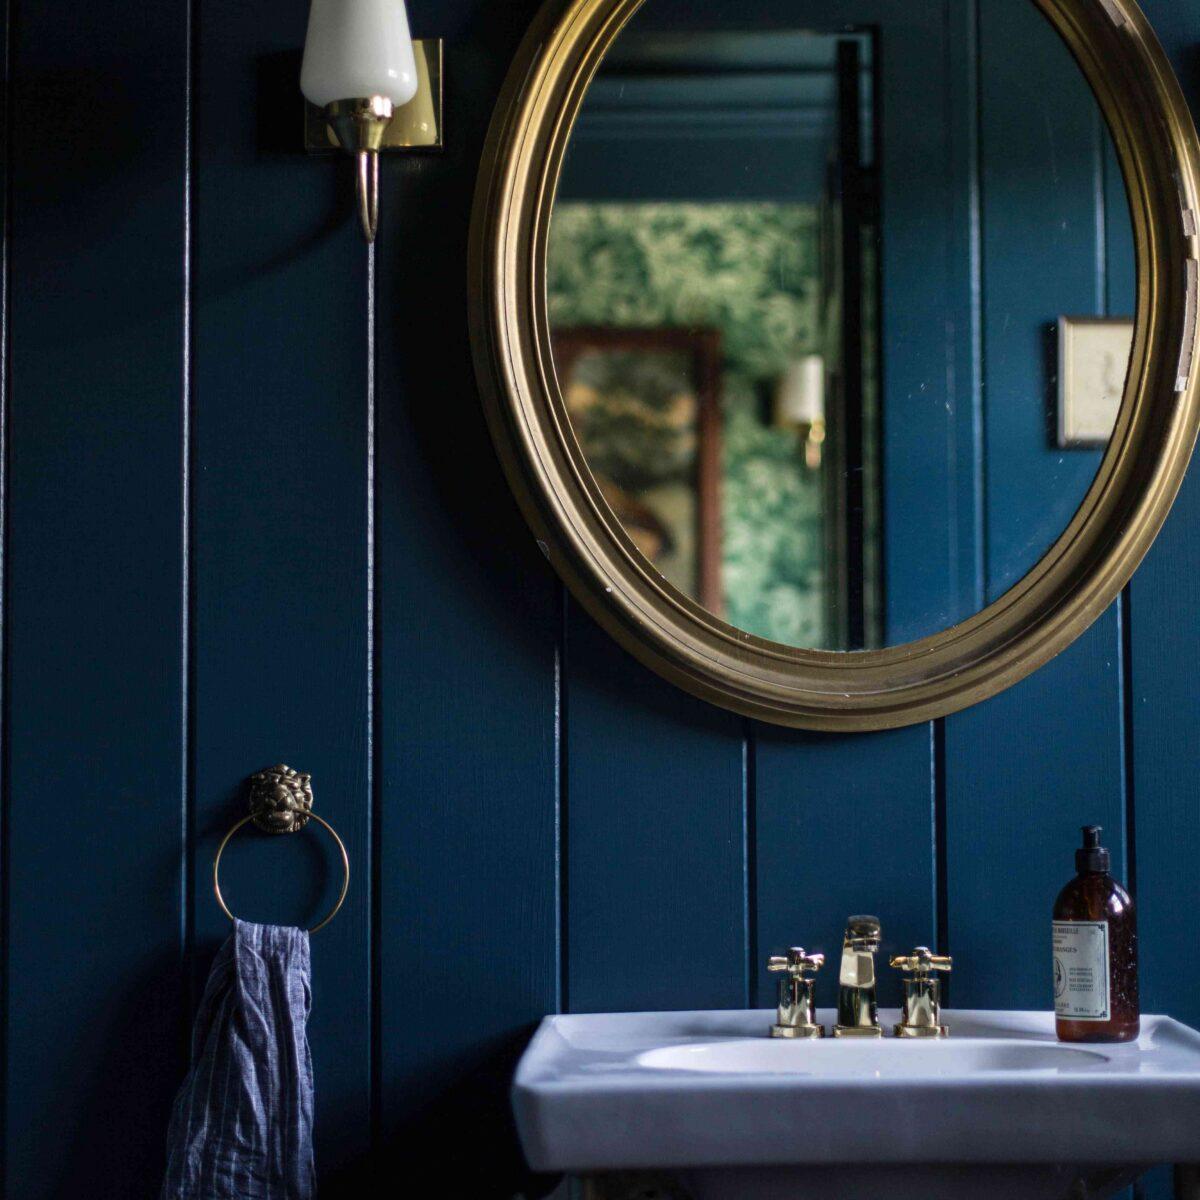 bagno-pareti-color-blu-navy-3